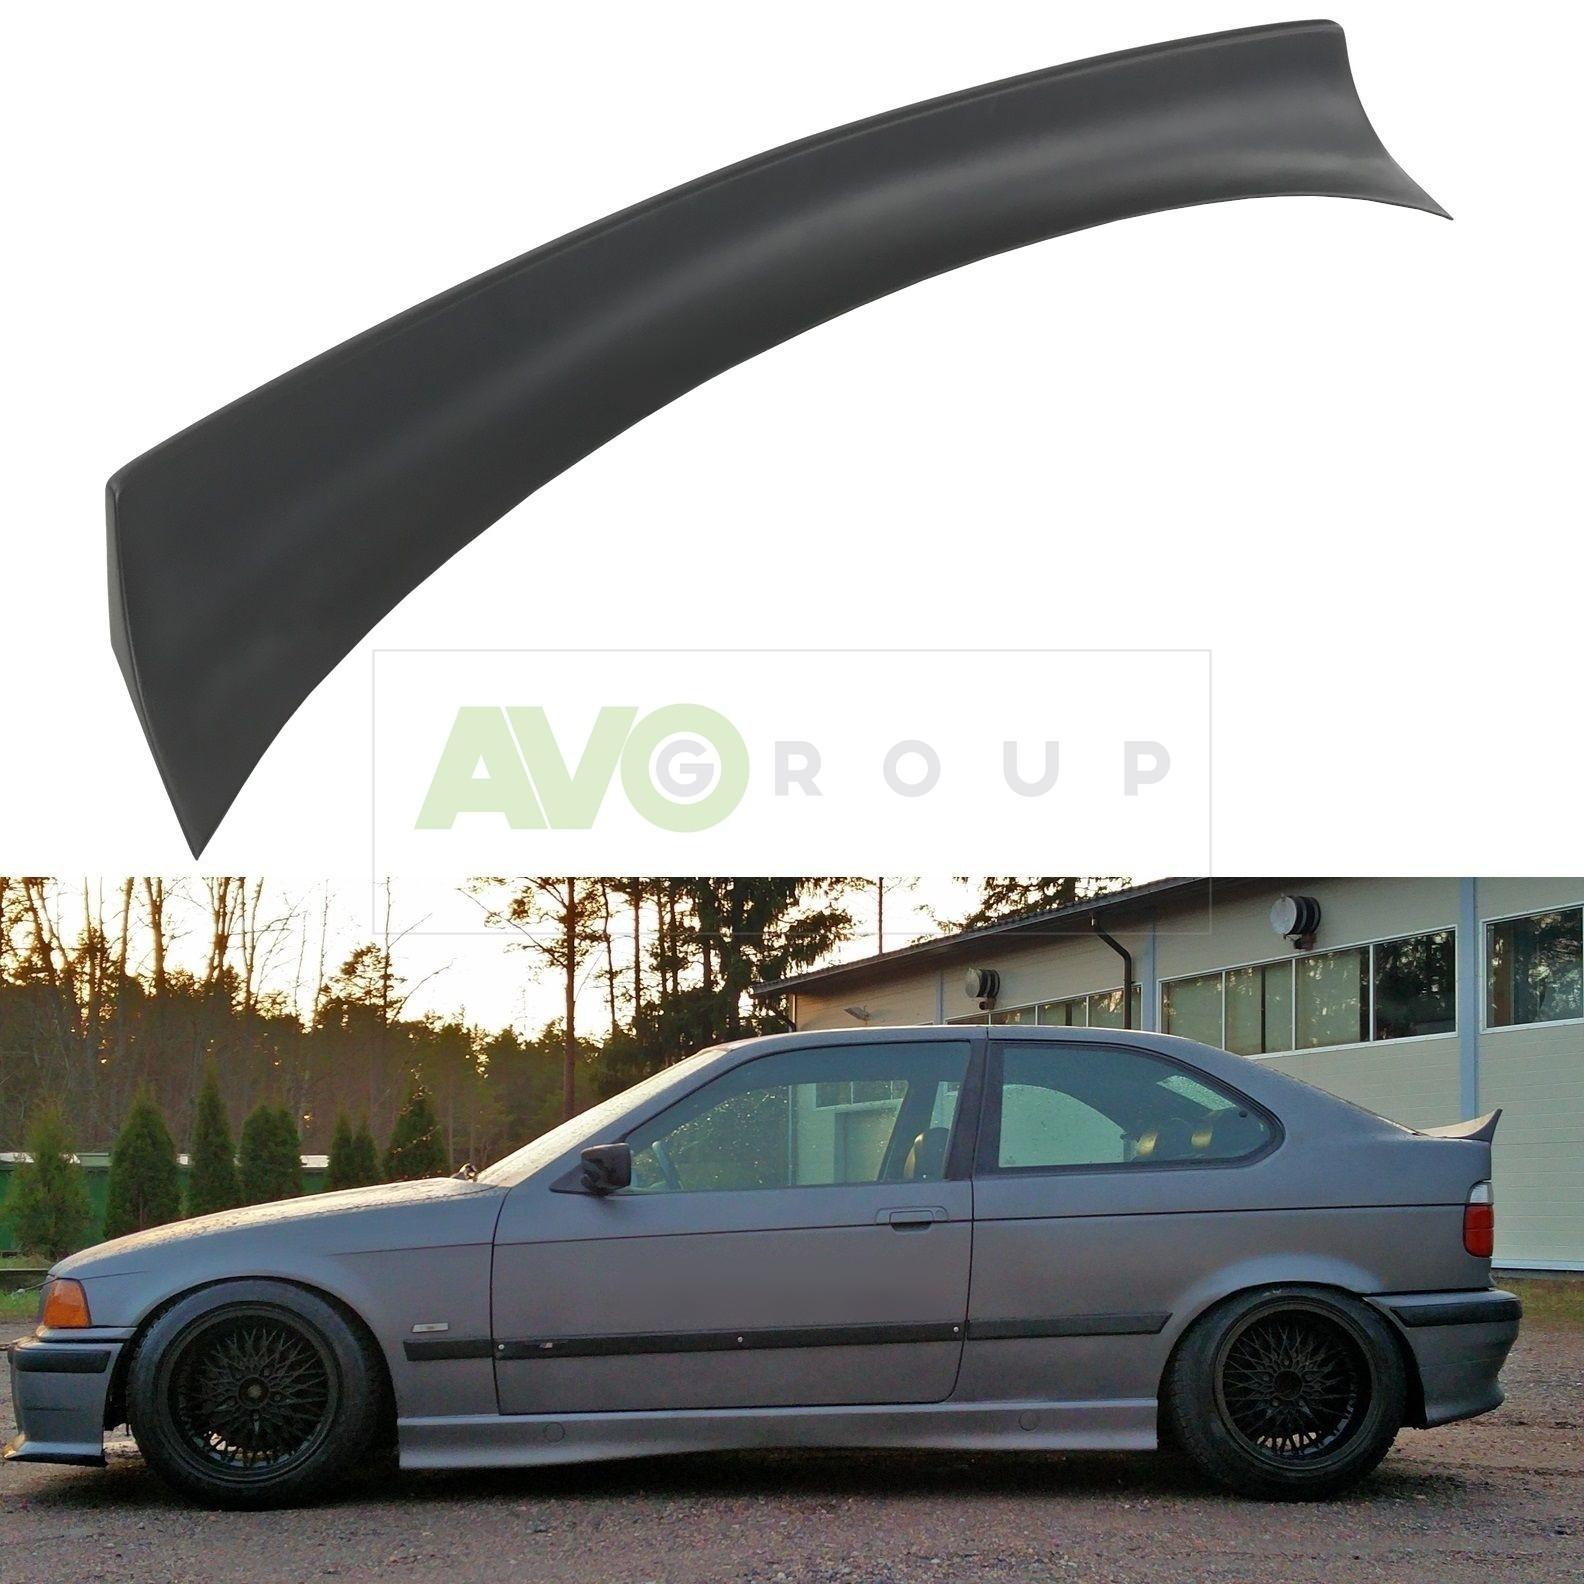 Jdm Rear Trunk Spoiler For Bmw 3 E36 93 00 Compact Avogroup Auto Parts Shop Service